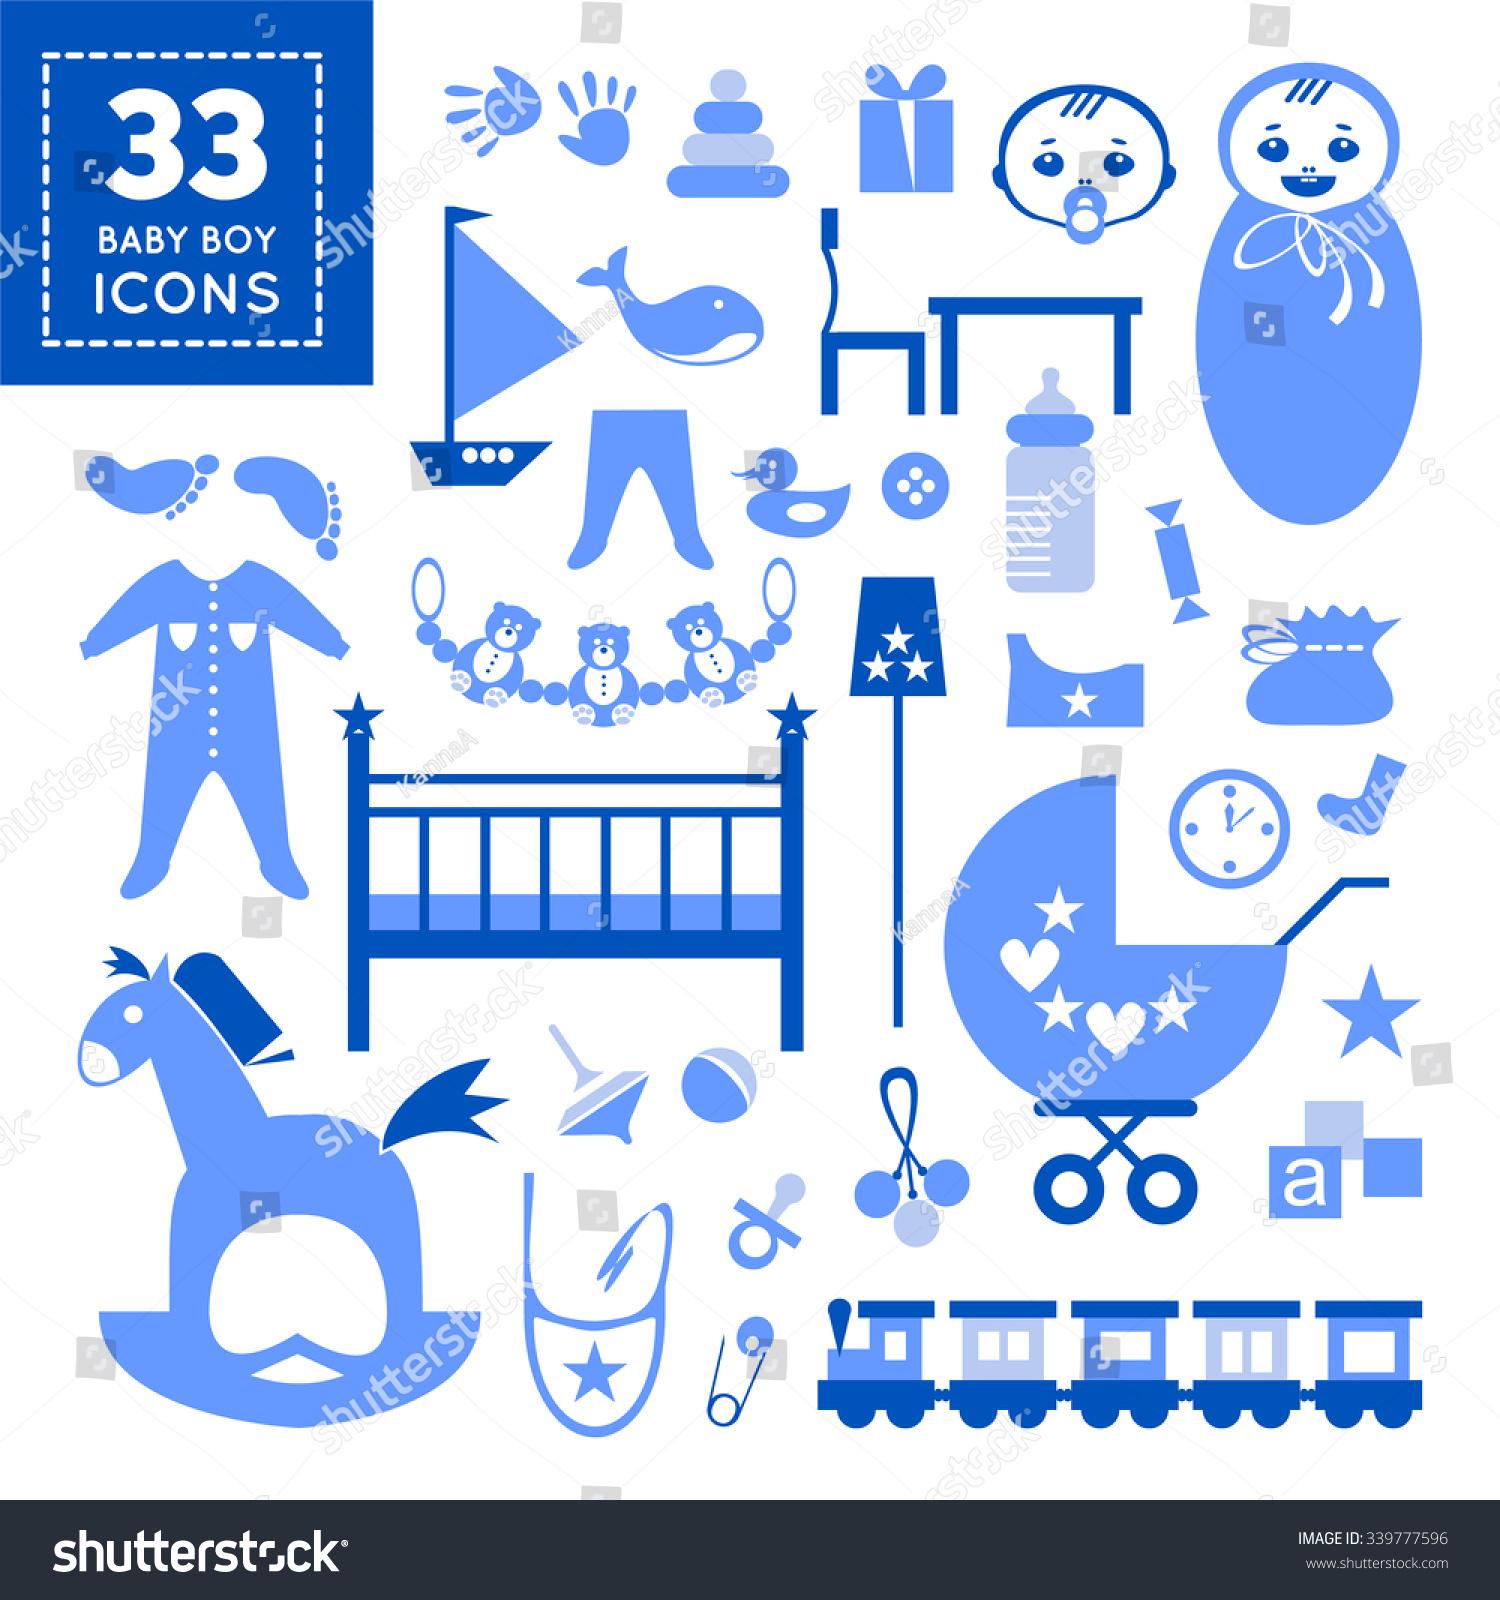 Color cards for kids - Color Cards For Kids Stylish Kids Elements In Blue Color For Baby Boy Flat Design